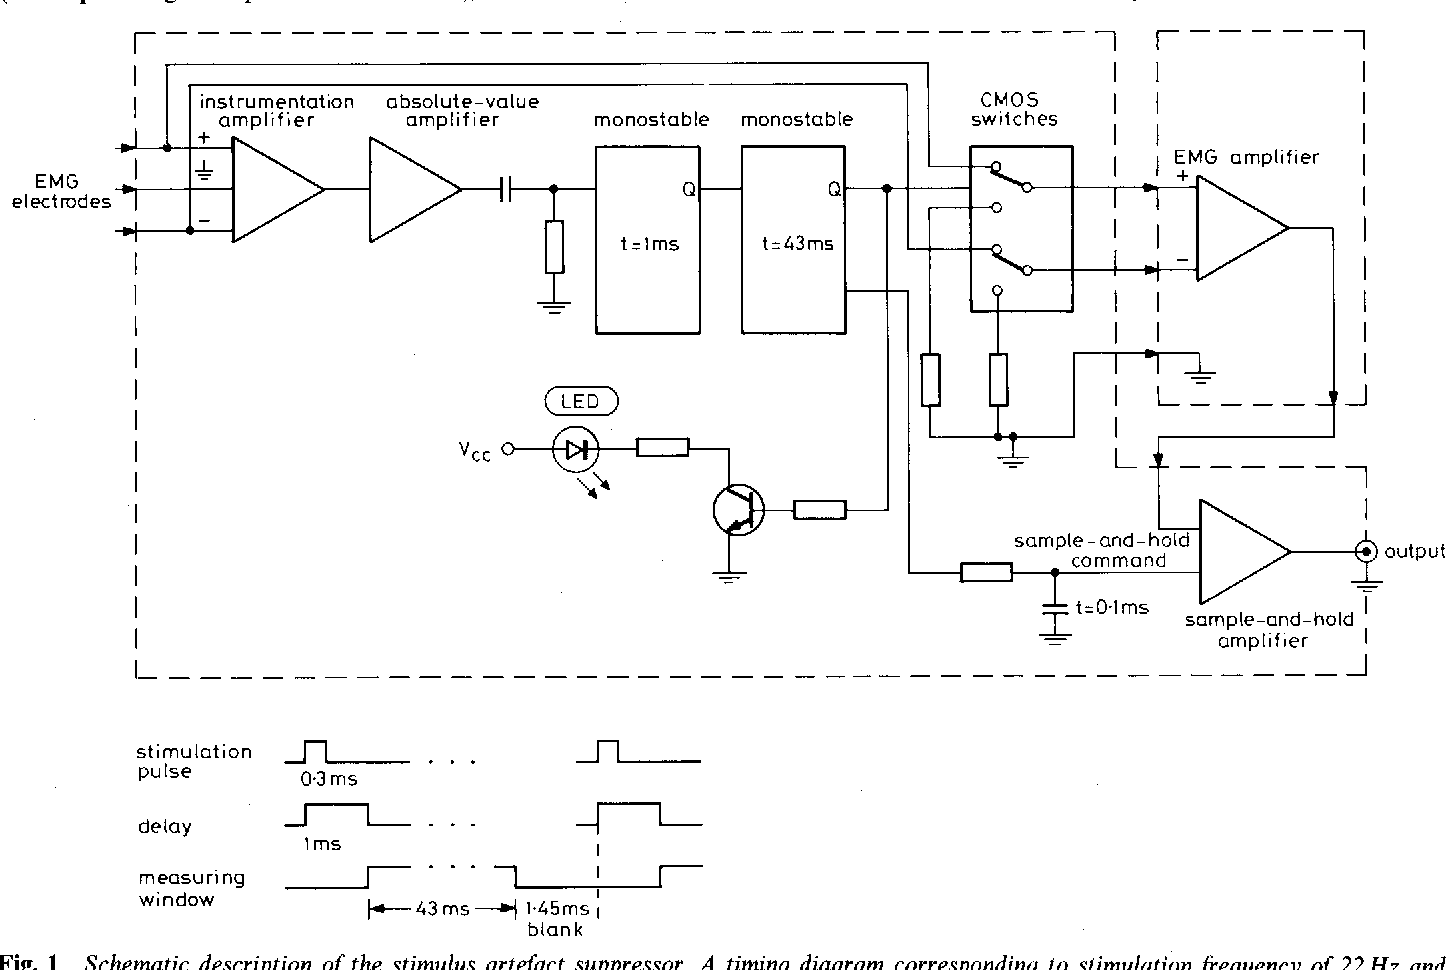 Ford Xlt 4 0 Ignition Switch Wiring Diagram Electrical Diagrams Datatool System 3 Apa Diy U2022